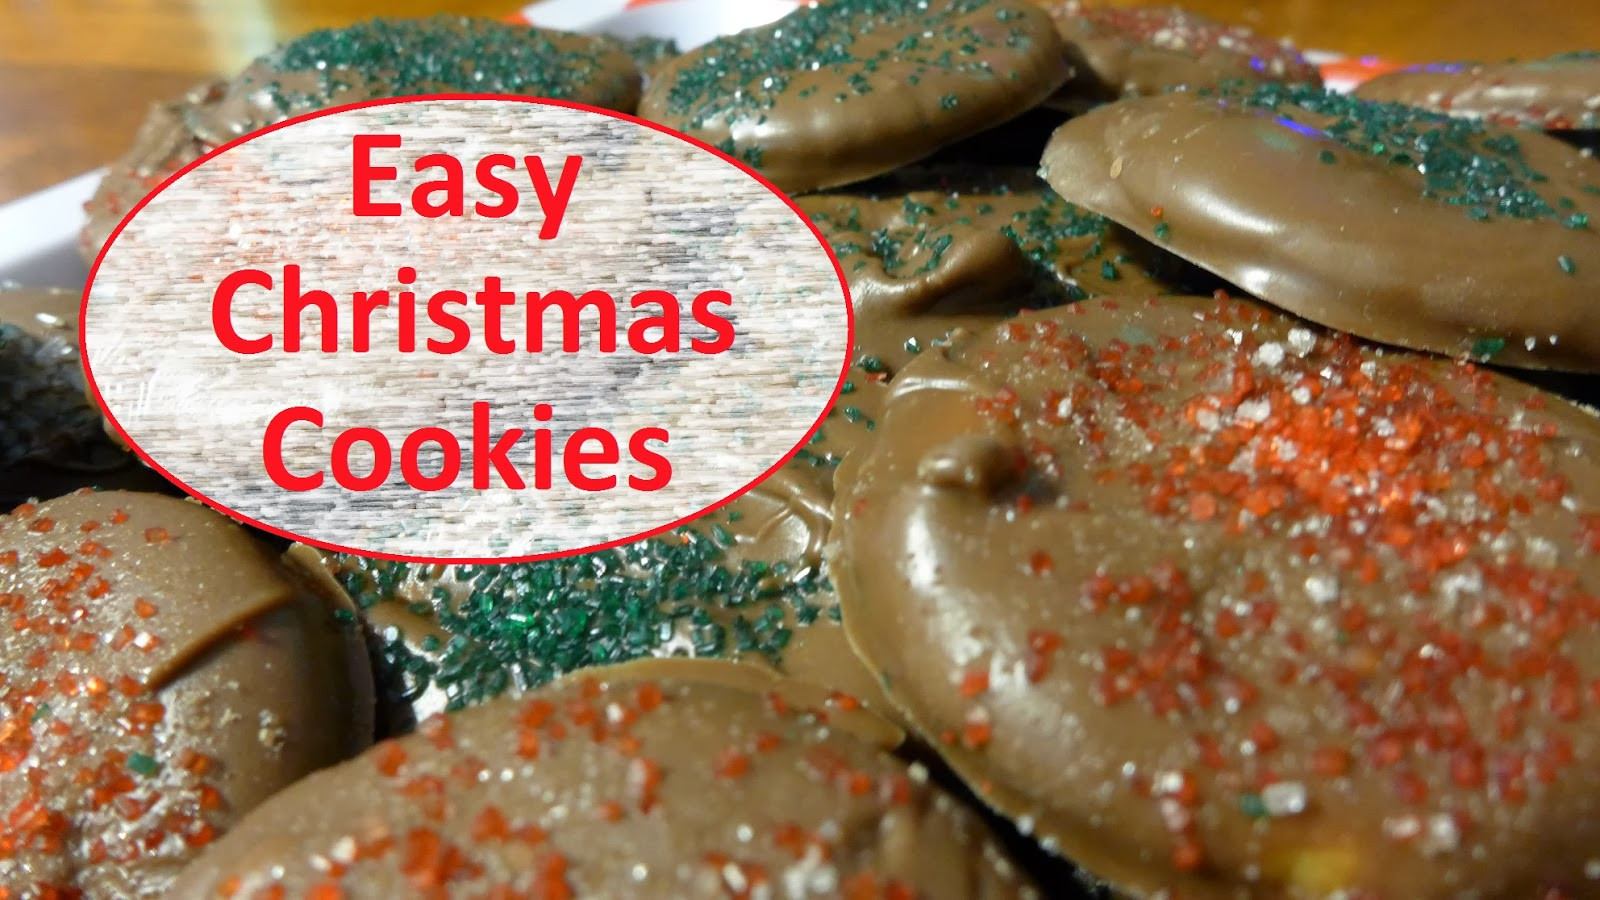 Easy To Make Christmas Cookies  EasyMeWorld How To Make Easy Christmas Cookies